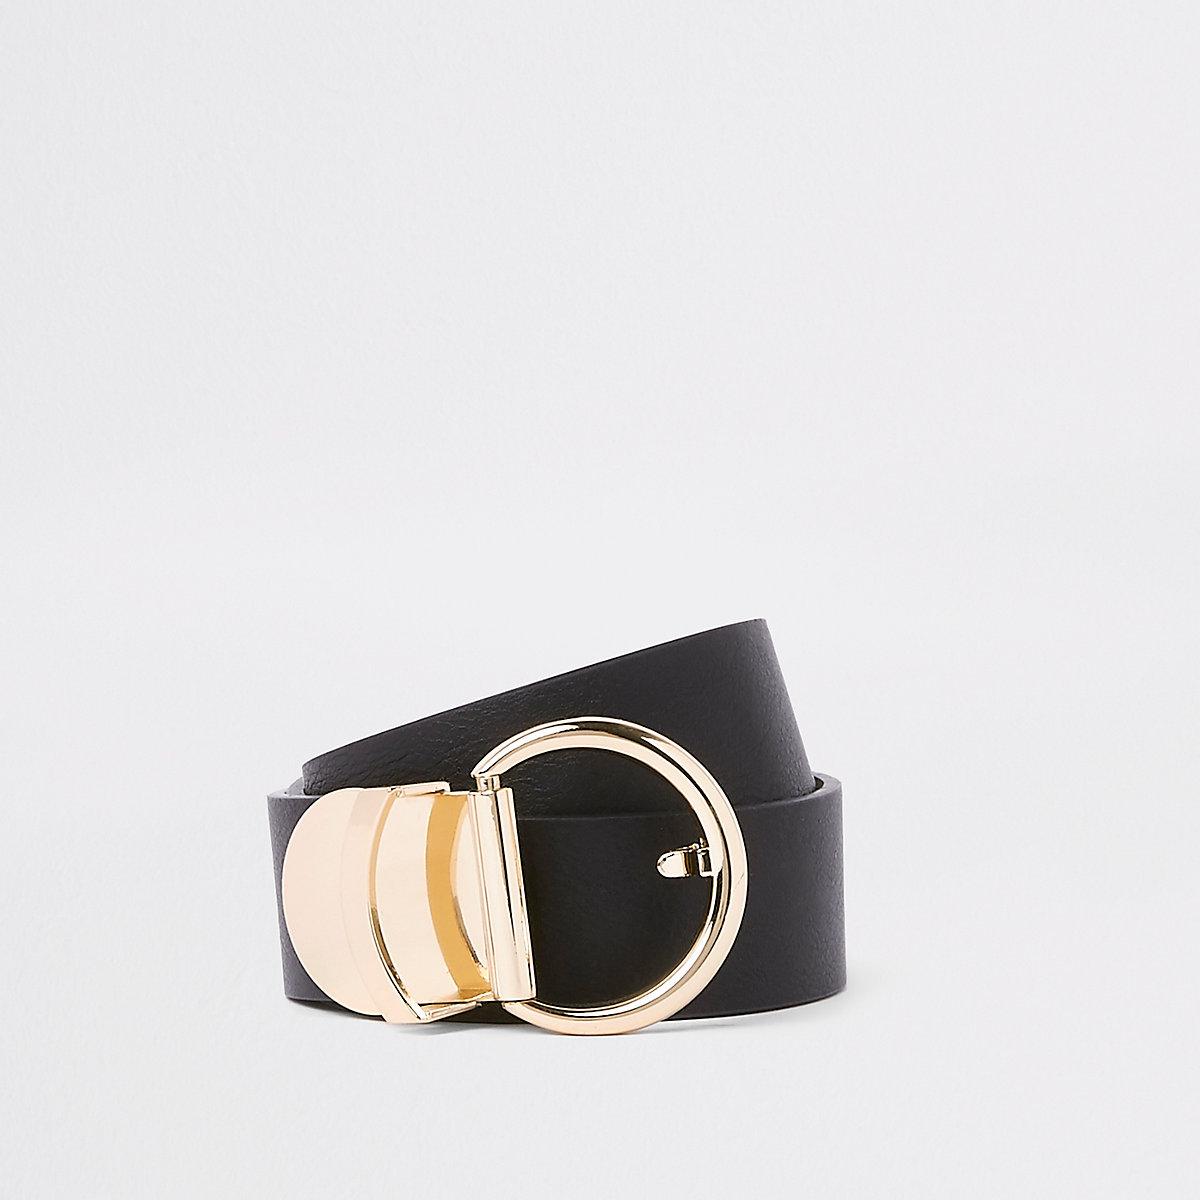 Black curved gold tone ring jeans belt